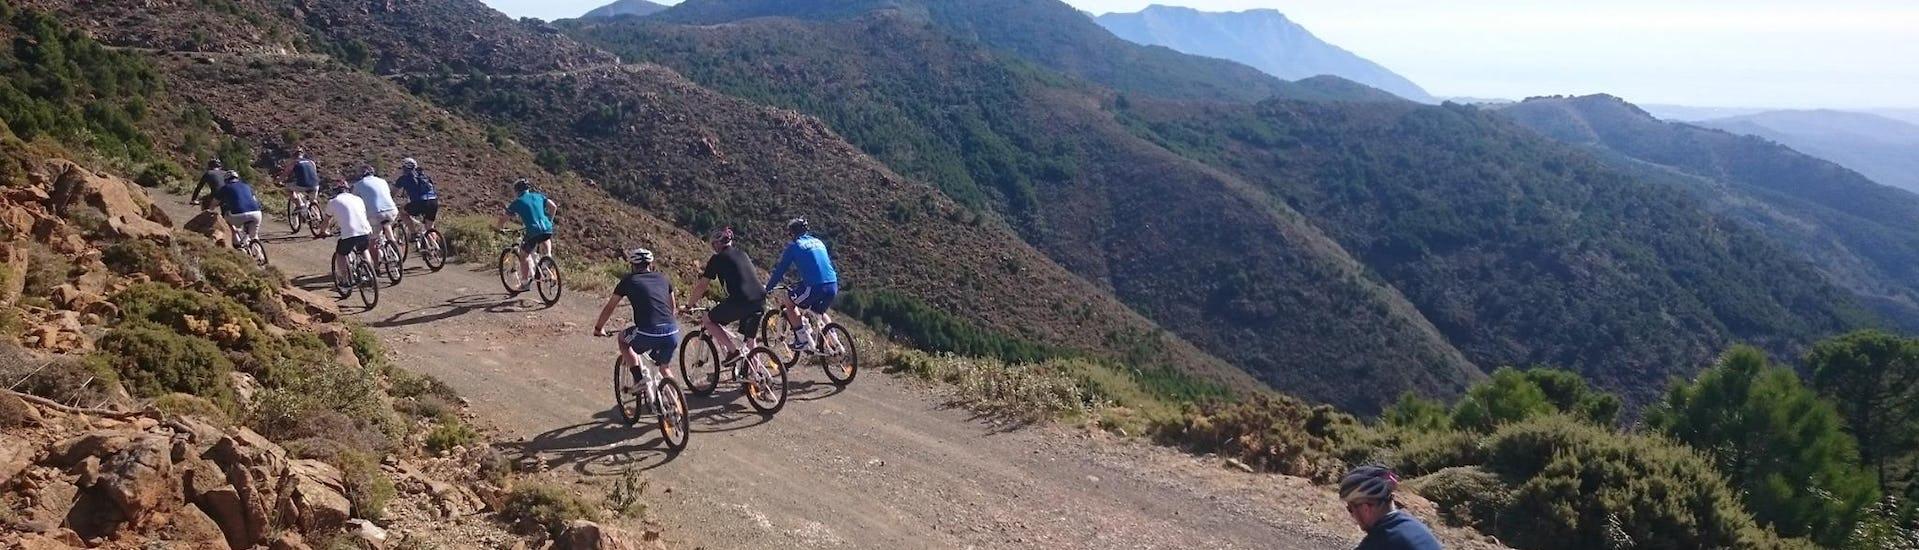 Downhill MTB Tour in Sierra de las Nieves - Marbella